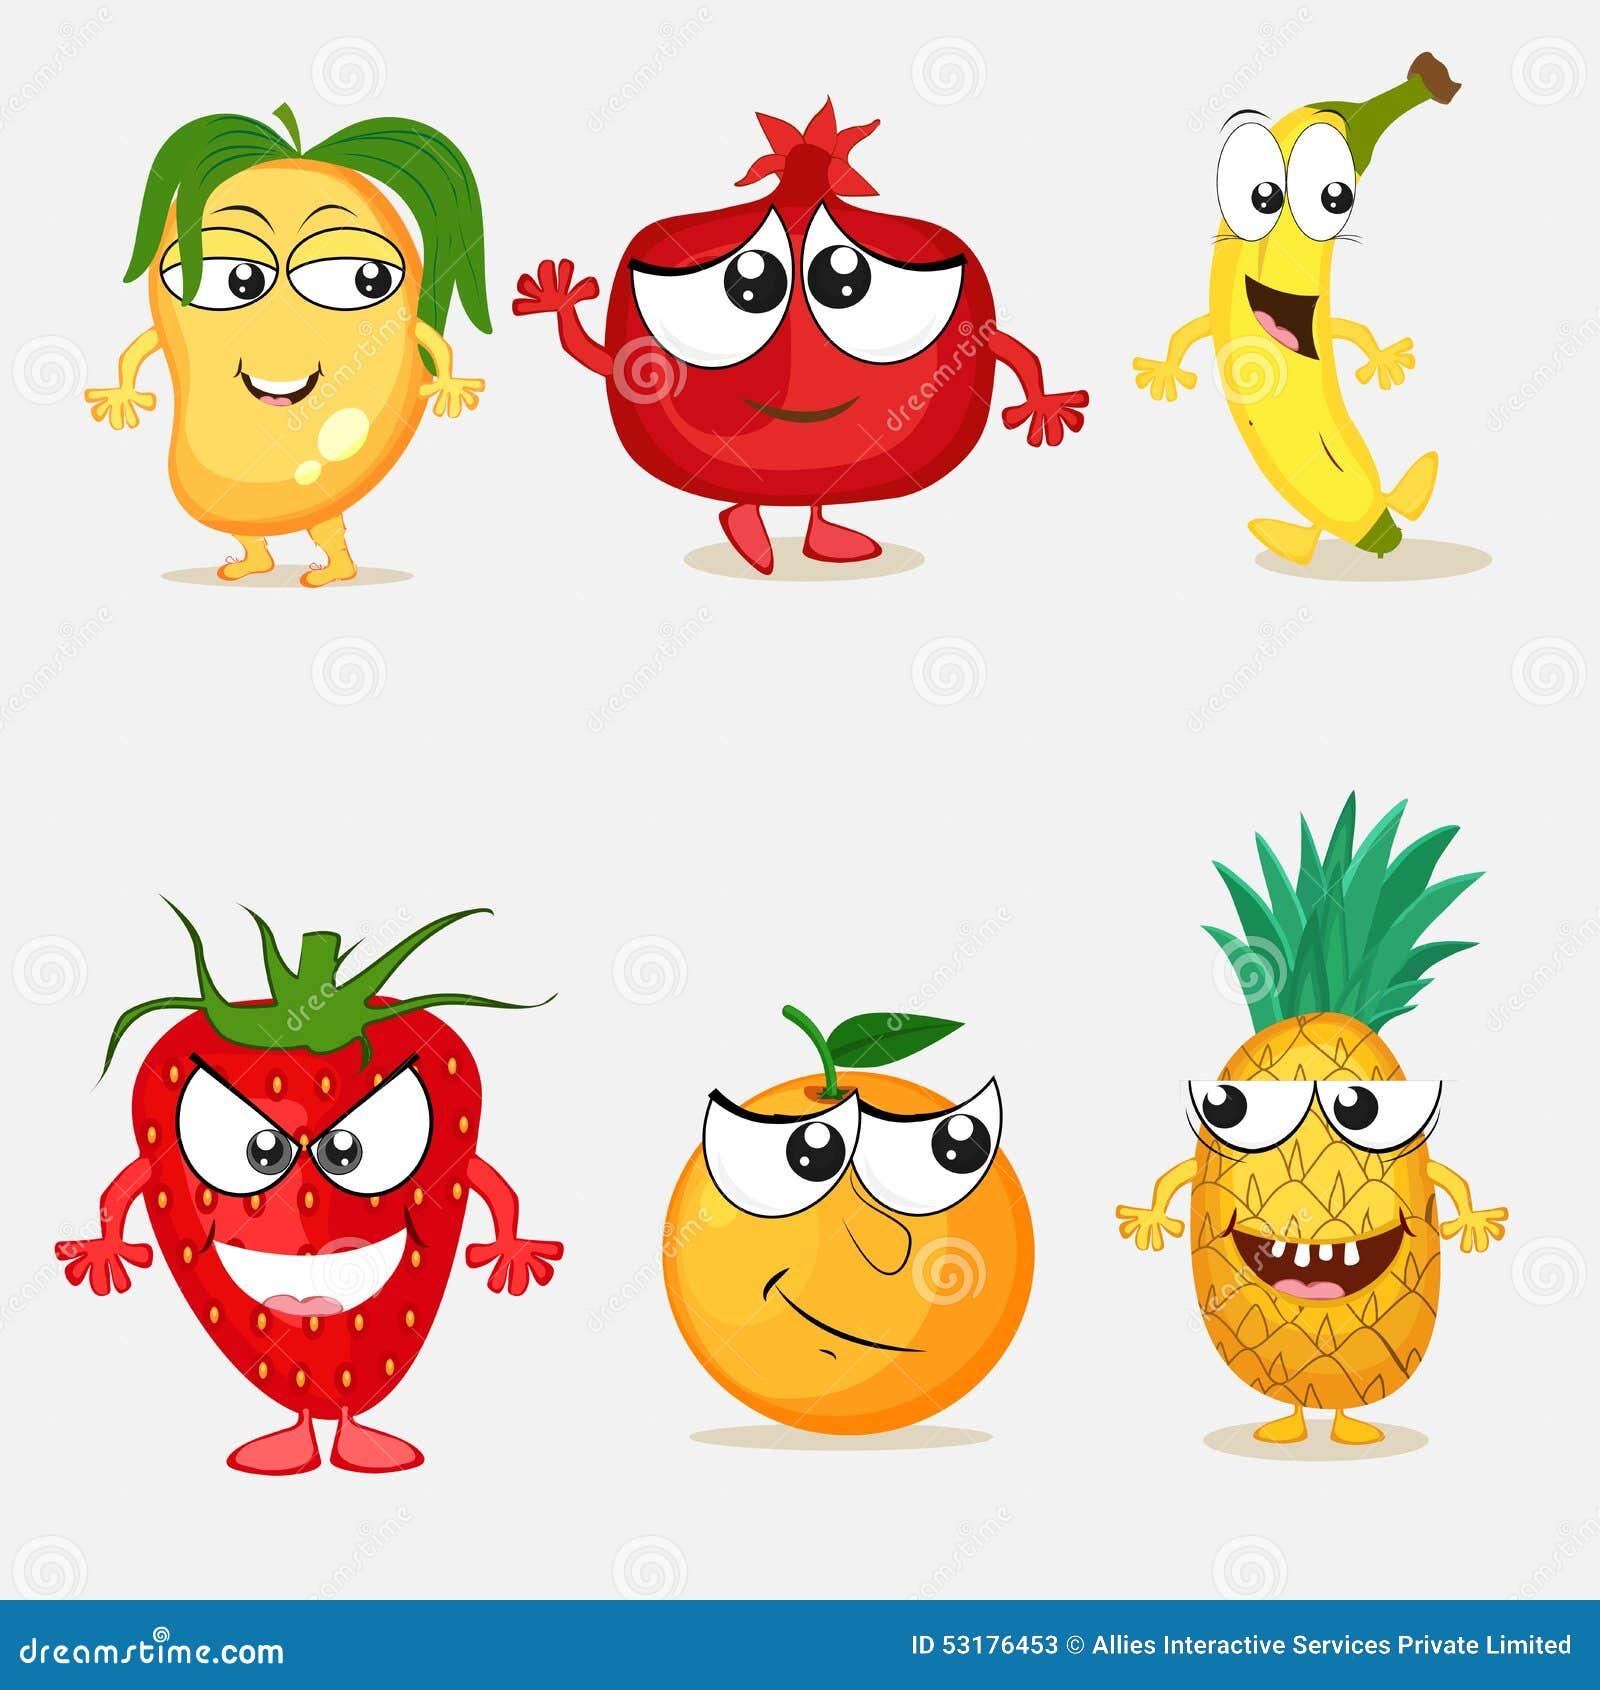 193091902743496452 moreover Cartoon Orange besides Un Nino Es Un Tesoro as well Stock Illustration Set Happy Fruit Cartoon Characters Funny Like Mango Pomegranate Banana Strawberry Orange Pineapple Image53176453 furthermore 1410 Pusheen Gifs. on mango cartoon character